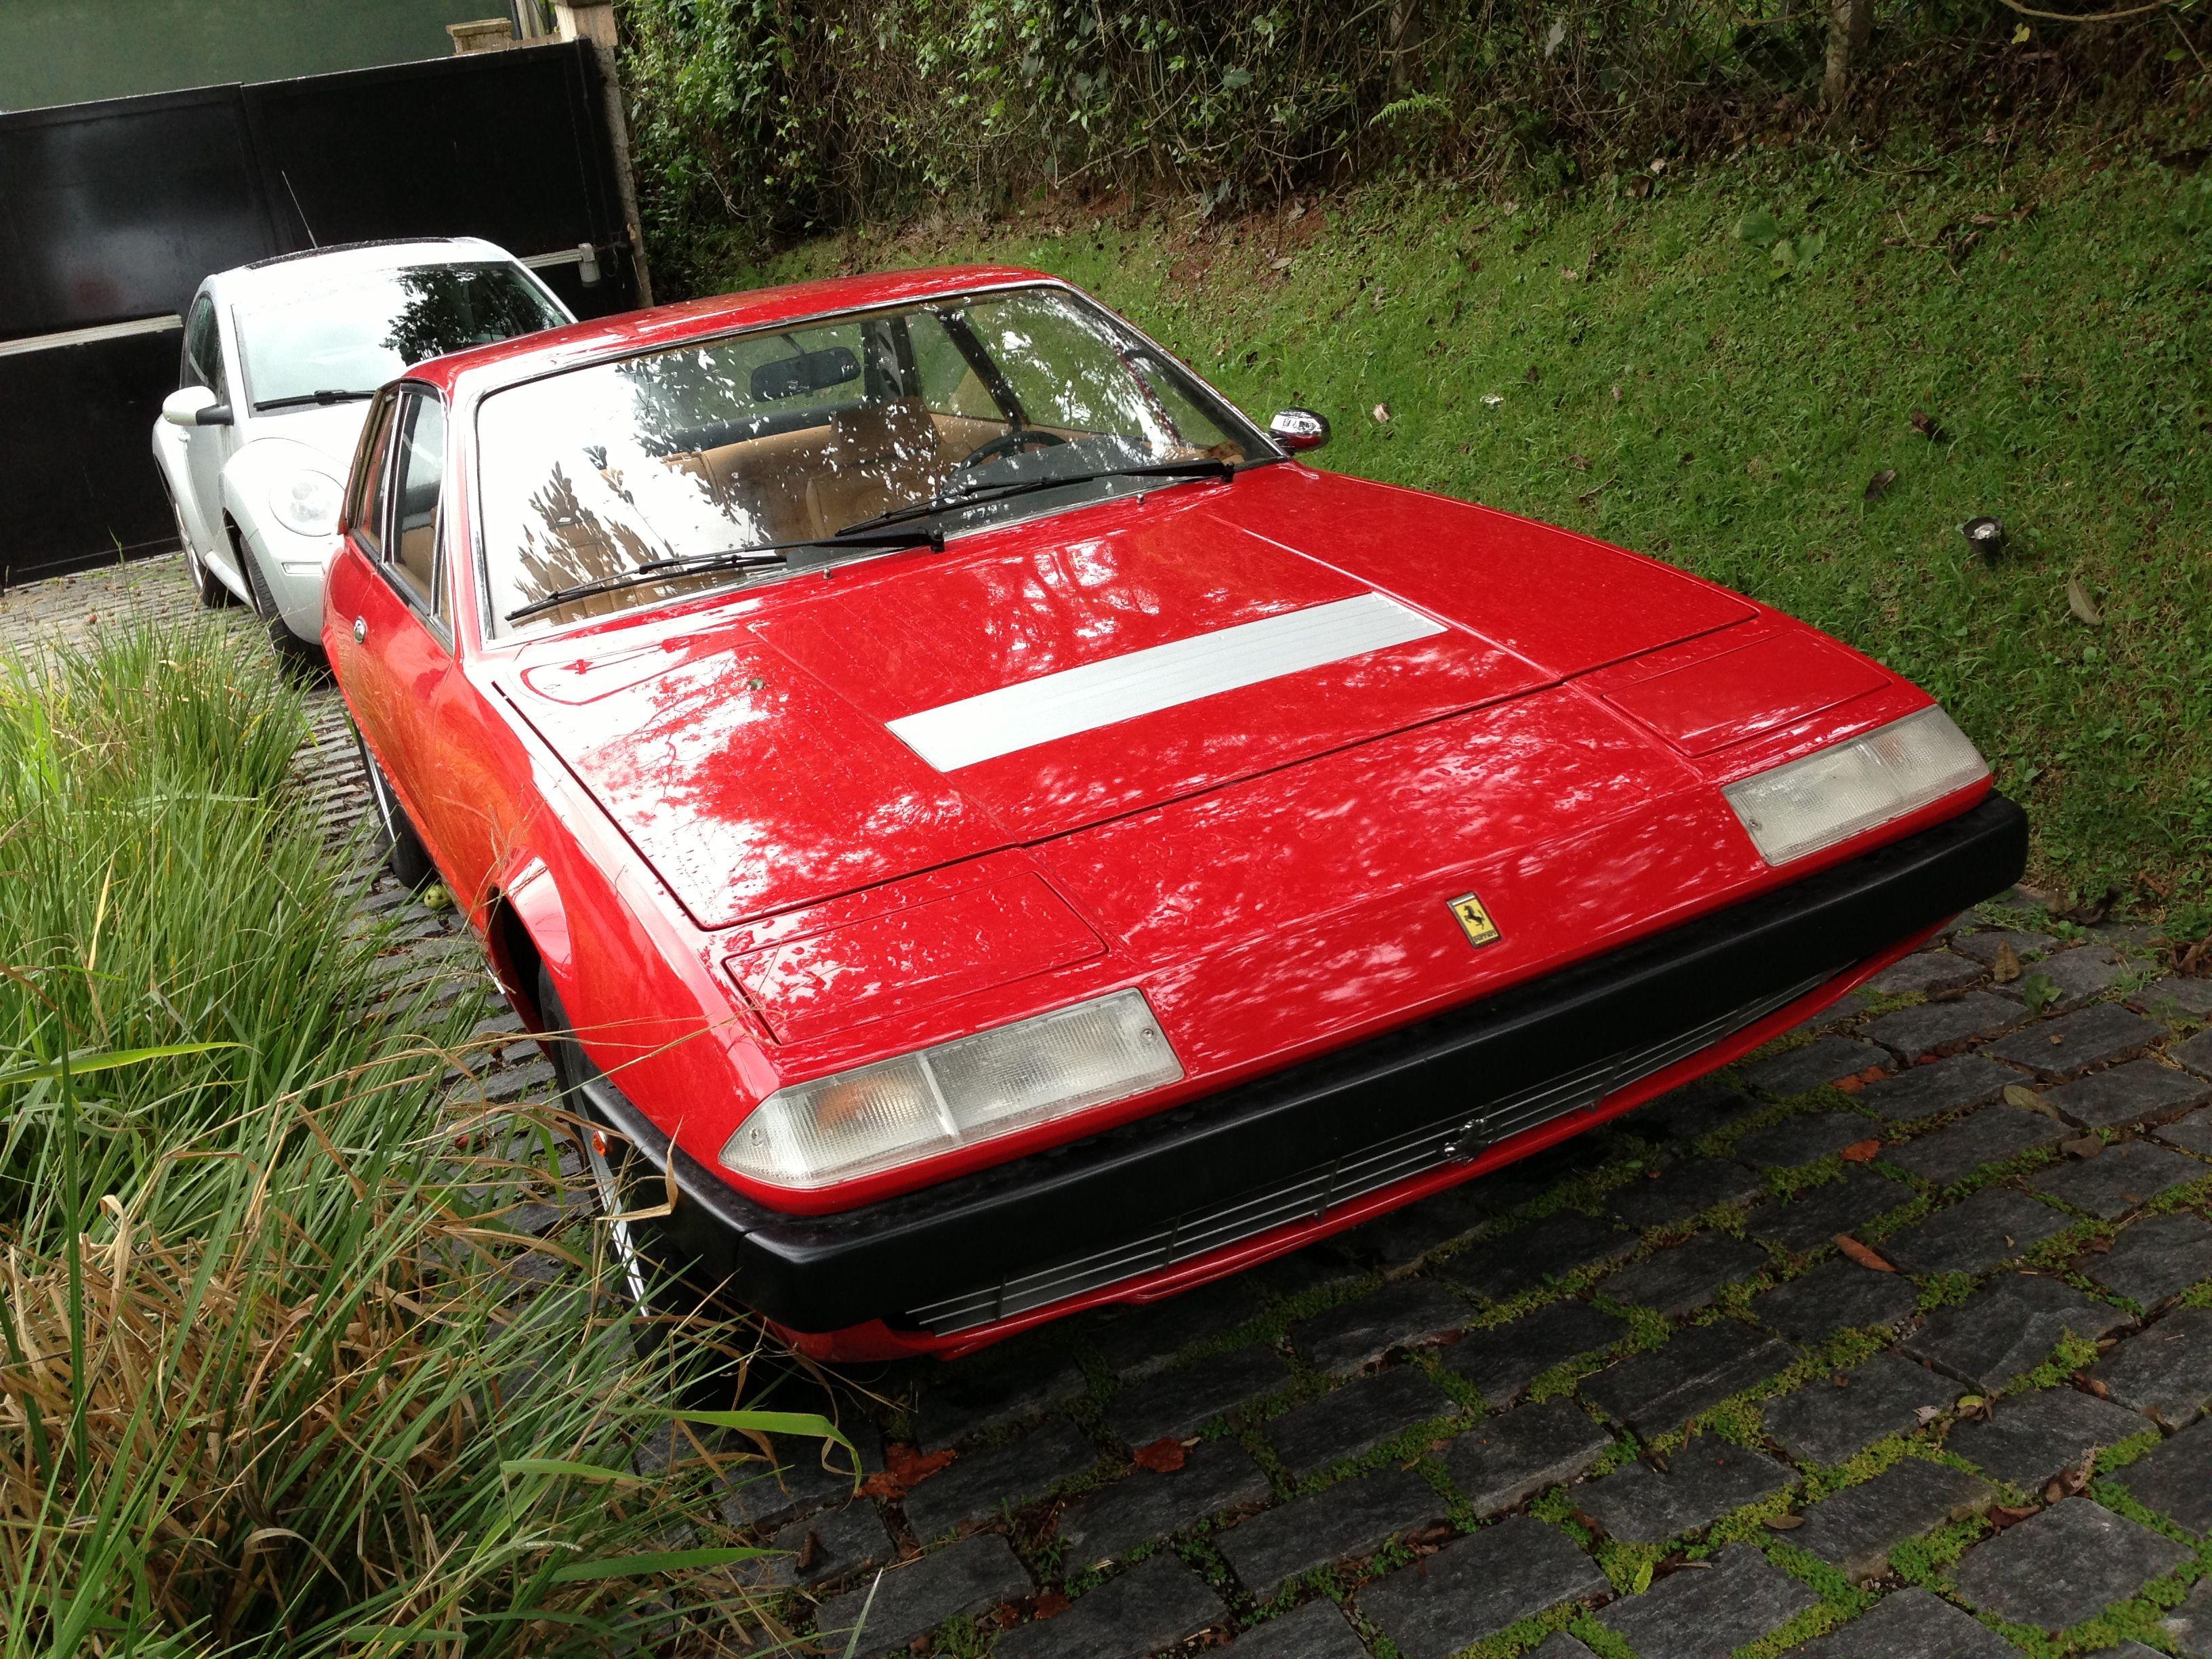 ea2ff52efe4c125d6383971e60215773 Gorgeous Ferrari Mondial 3.2 Cabriolet V8 Quattrovalvole Cars Trend